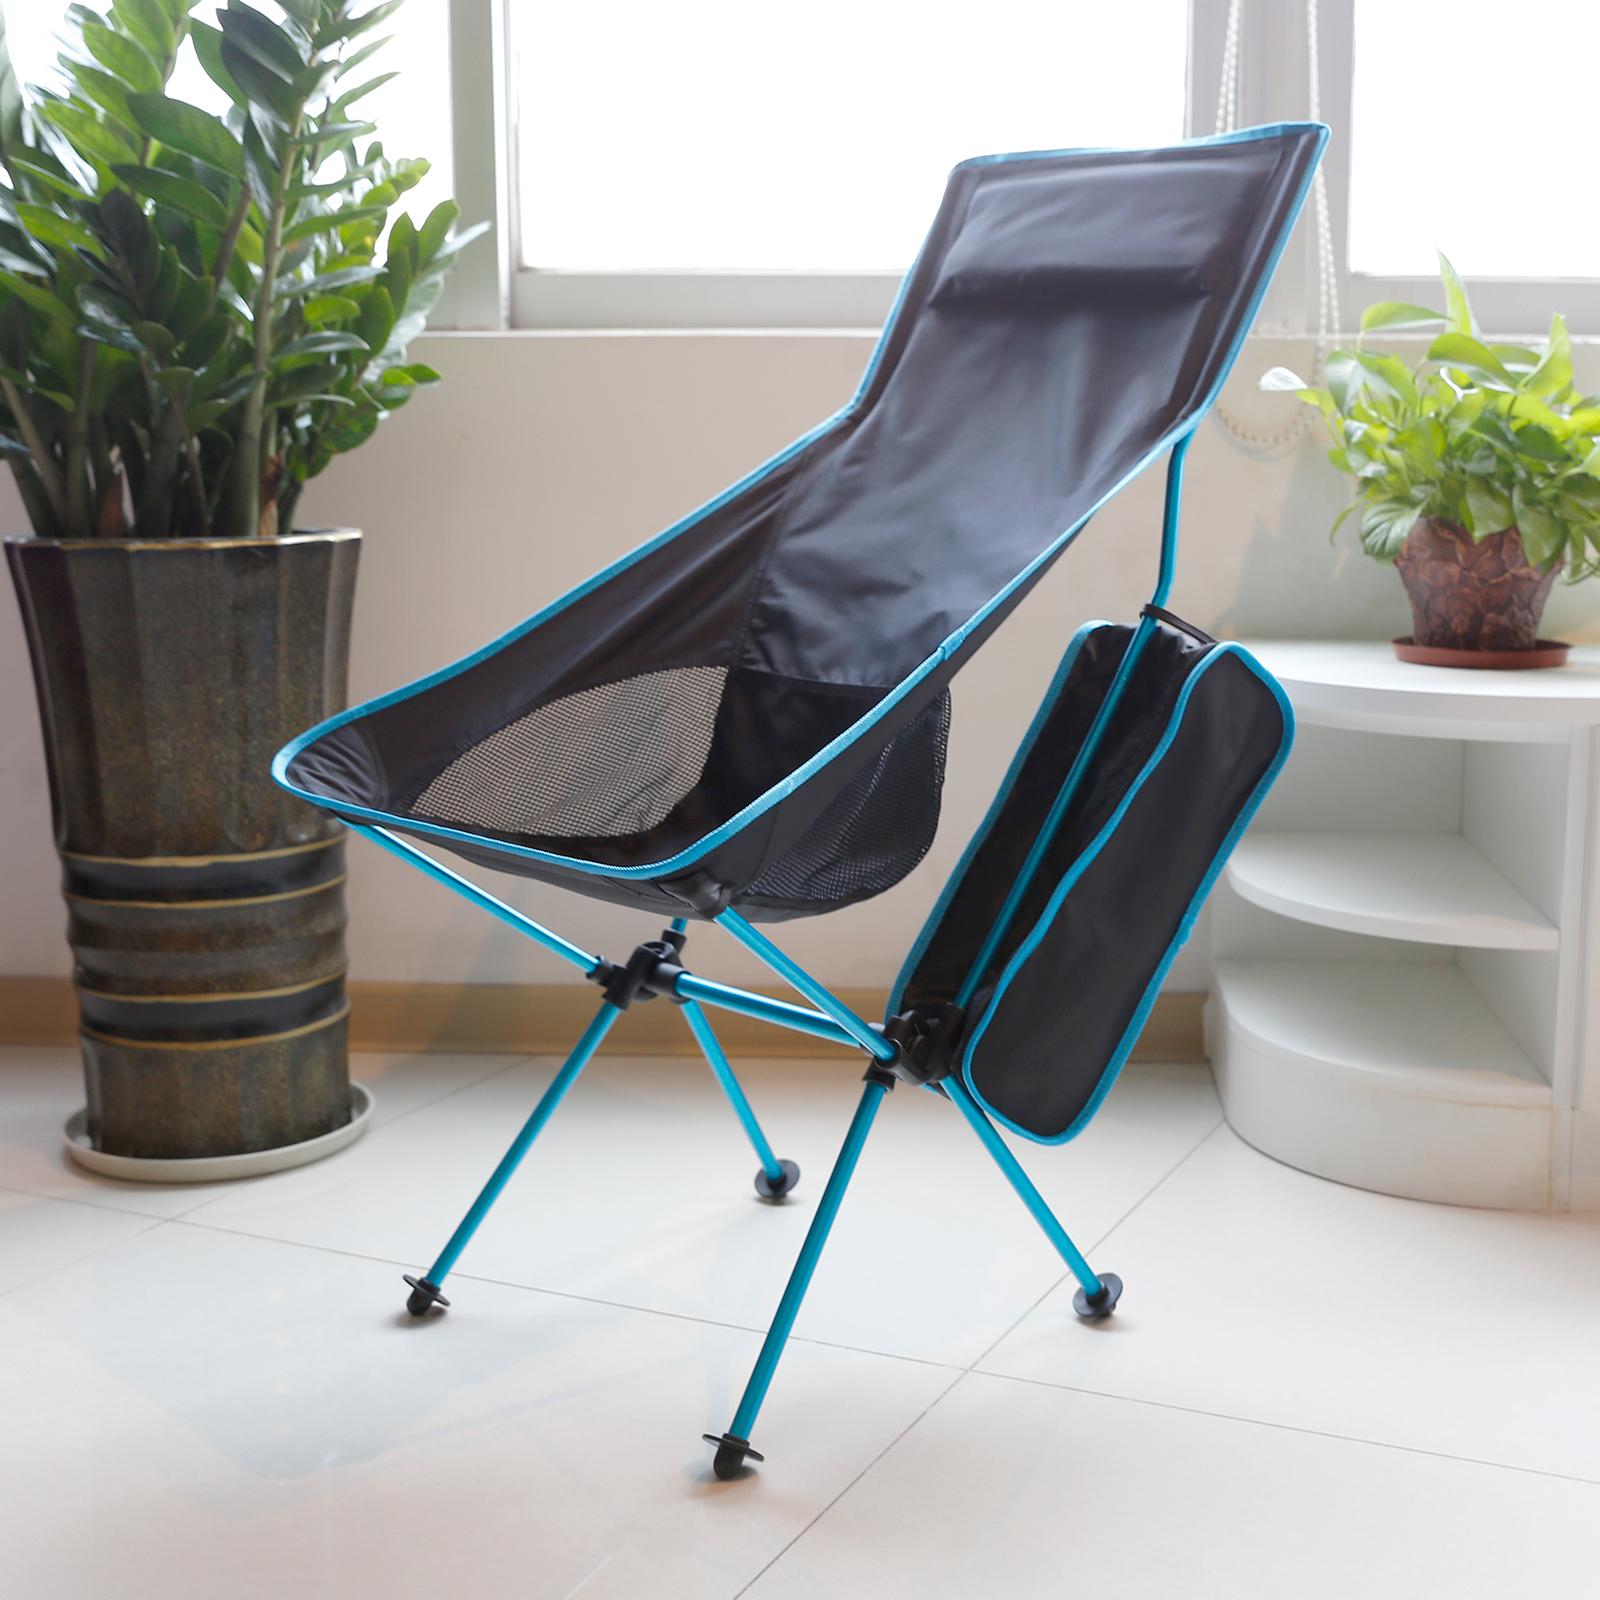 camping folding chair fishing hiking portable lightweight seat stool